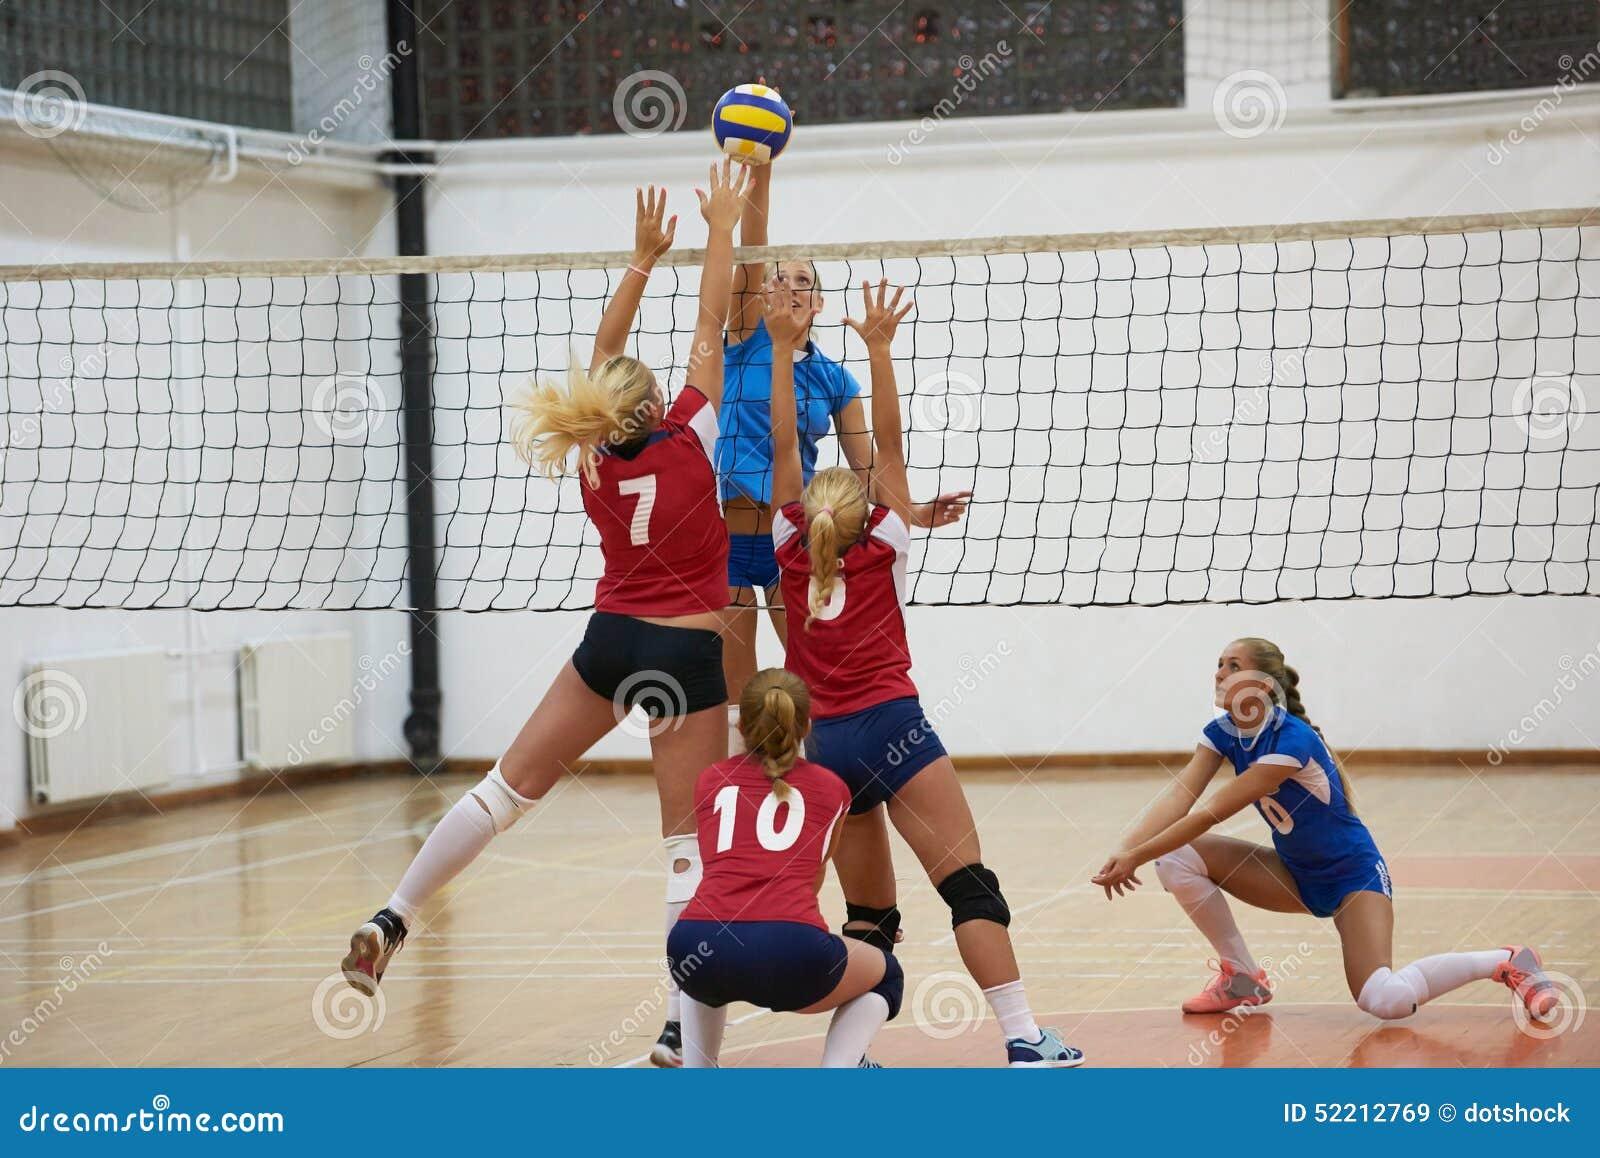 Volleyball Sport Games